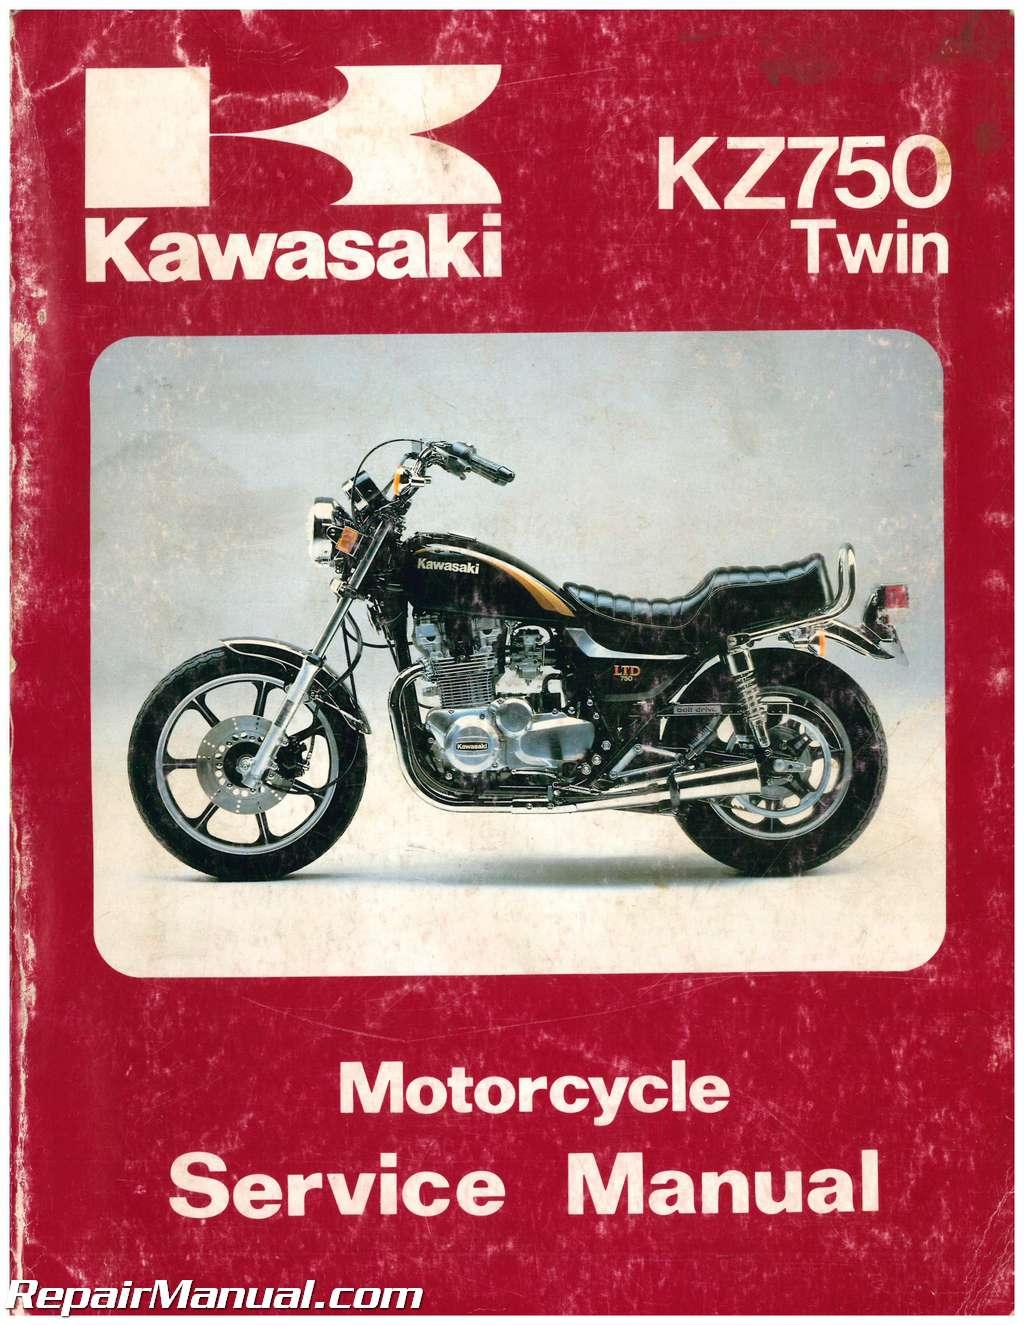 kz750 80 wiring diagram 591 used 1979 1983 kawasaki kz750 twin cylinder motorcycle  1983 kawasaki kz750 twin cylinder